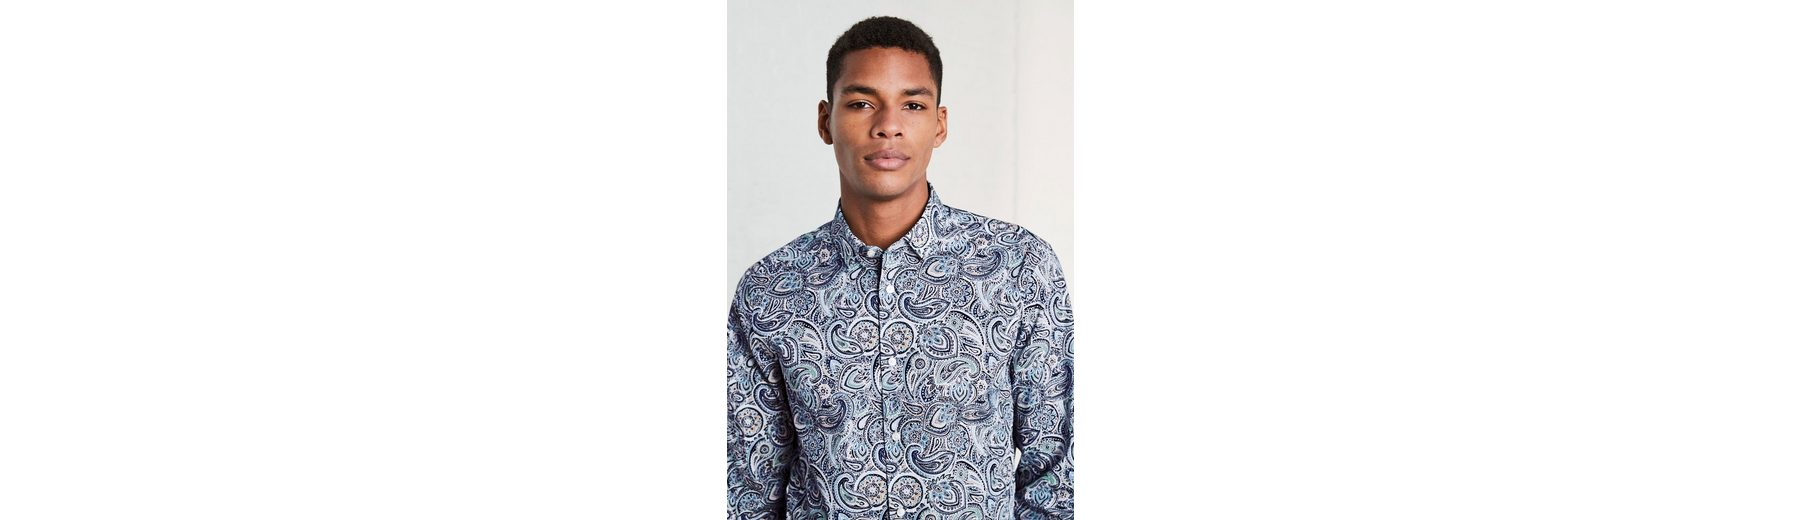 Freie Versandpreise Modisch Next Regular-Fit-Hemd mit Paisley-Muster 8zAGvA